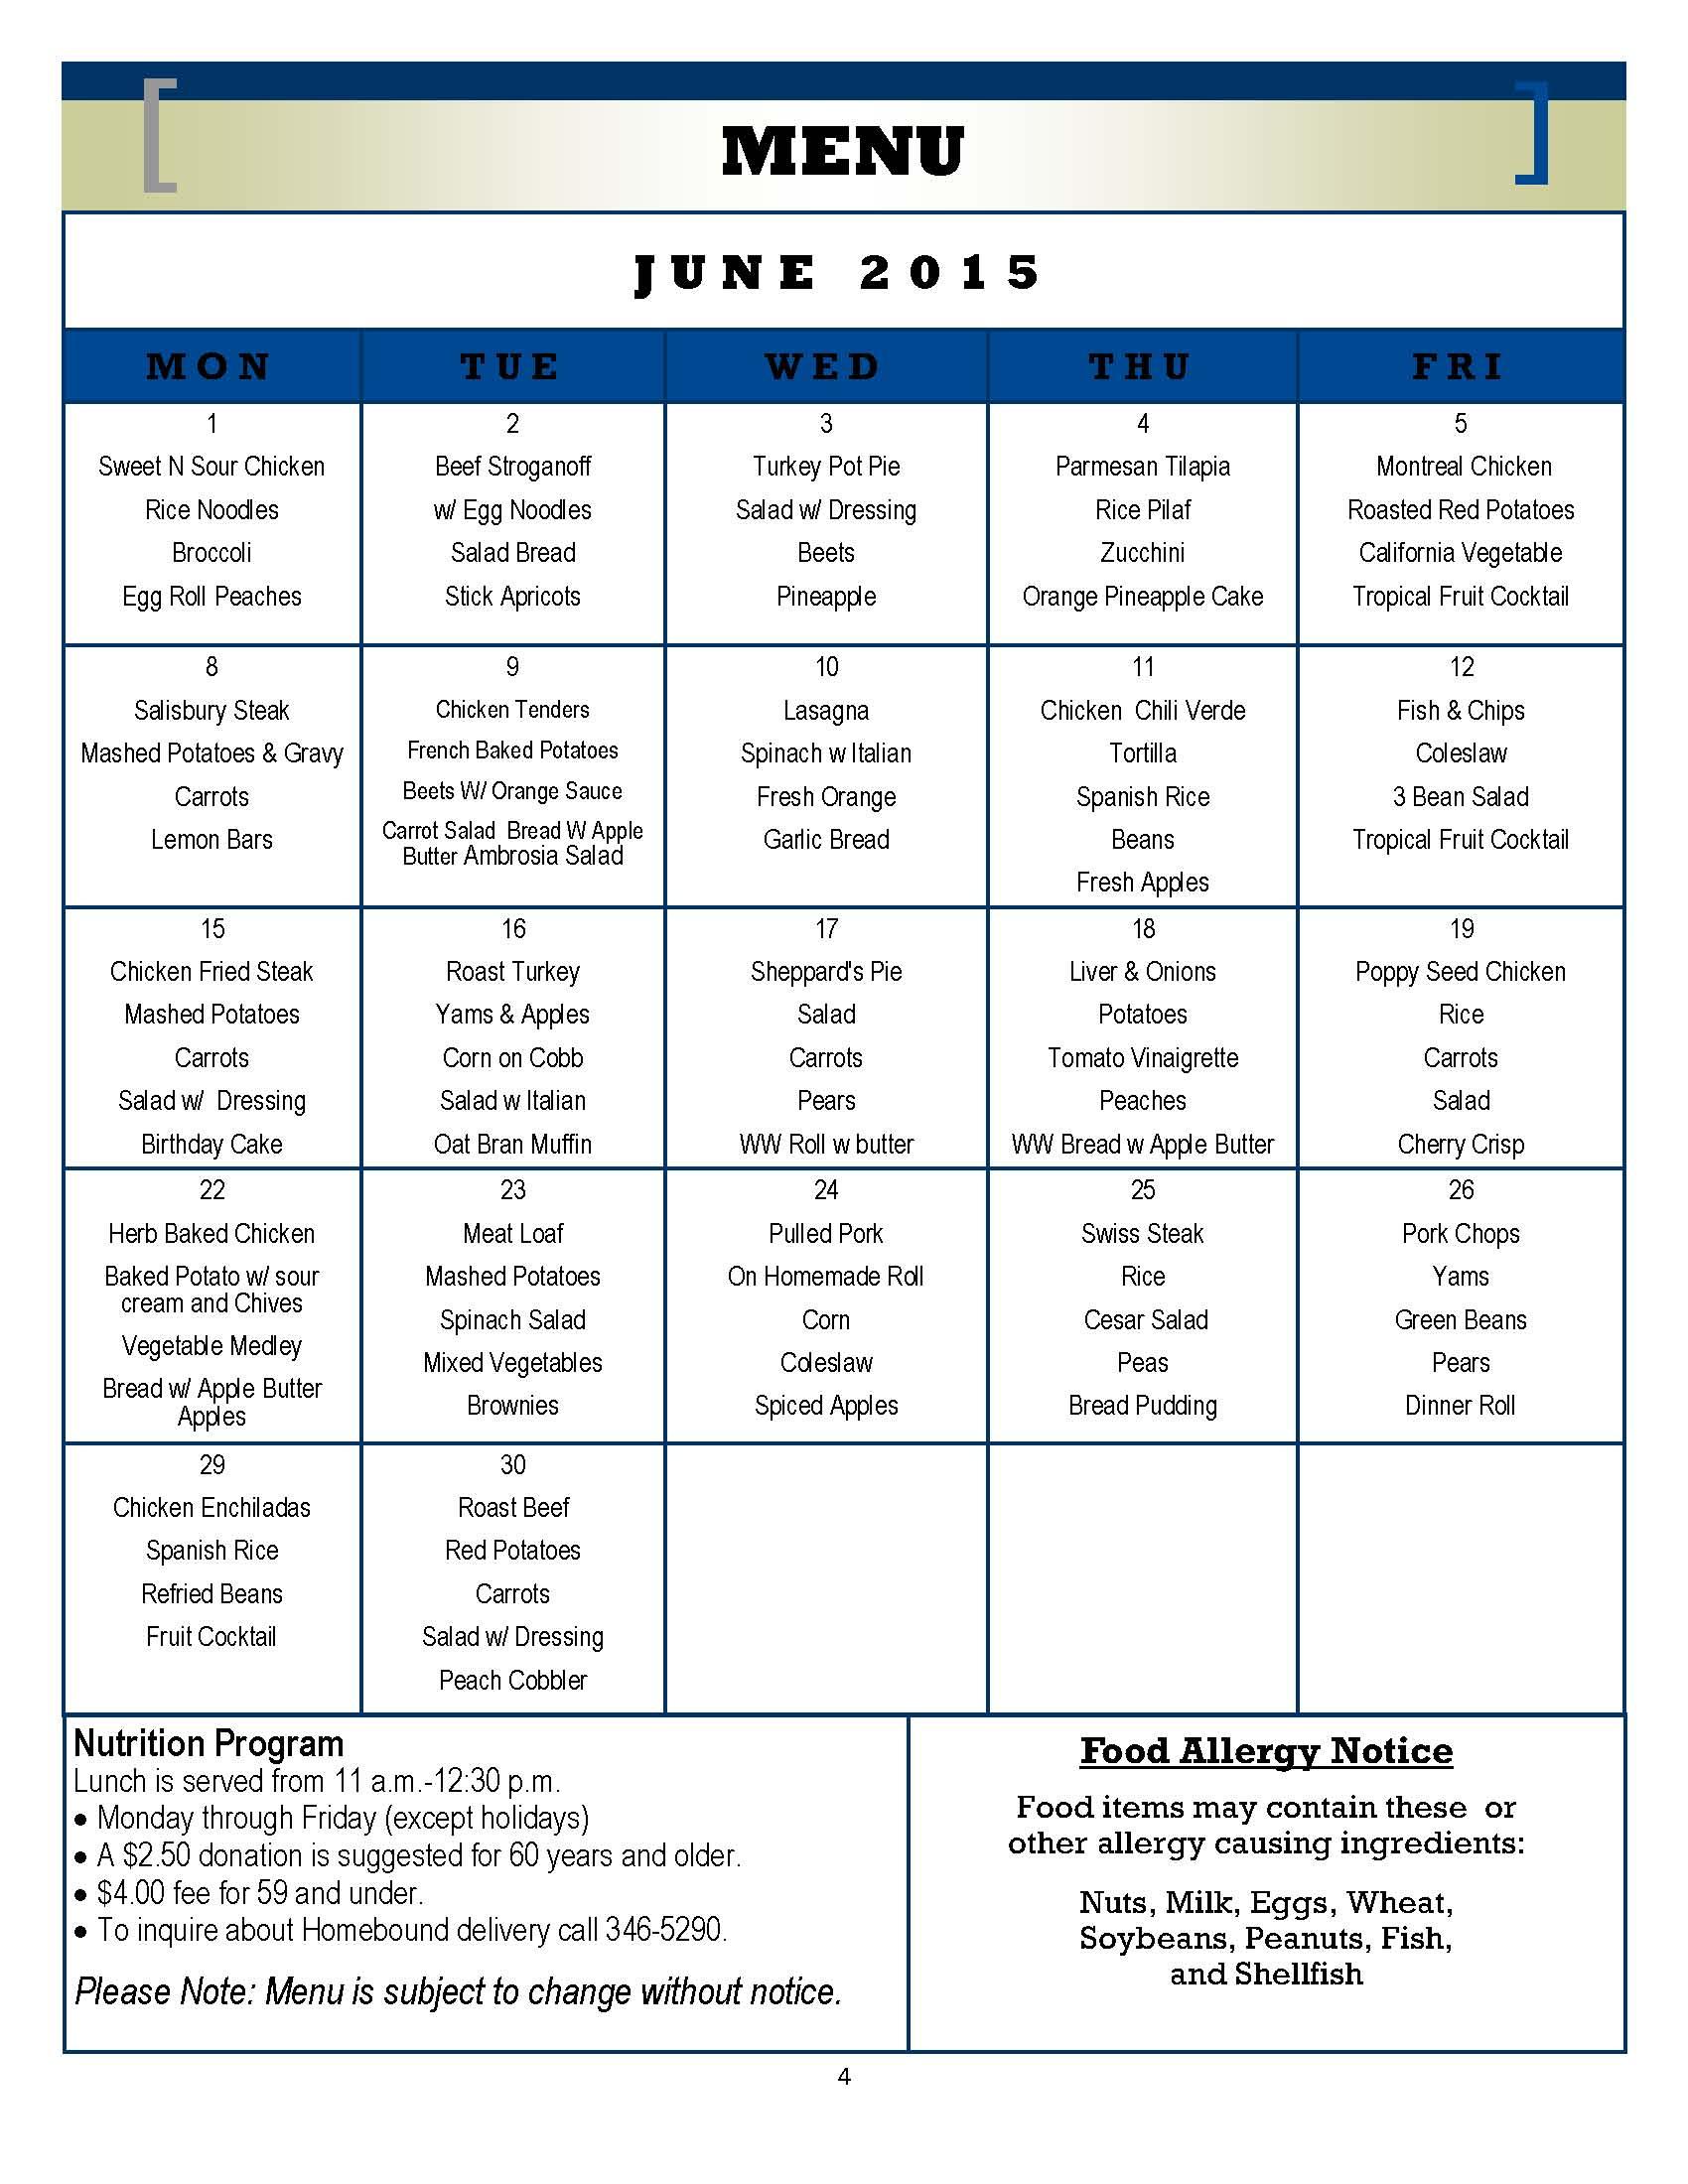 Senior Center Menu June 2015